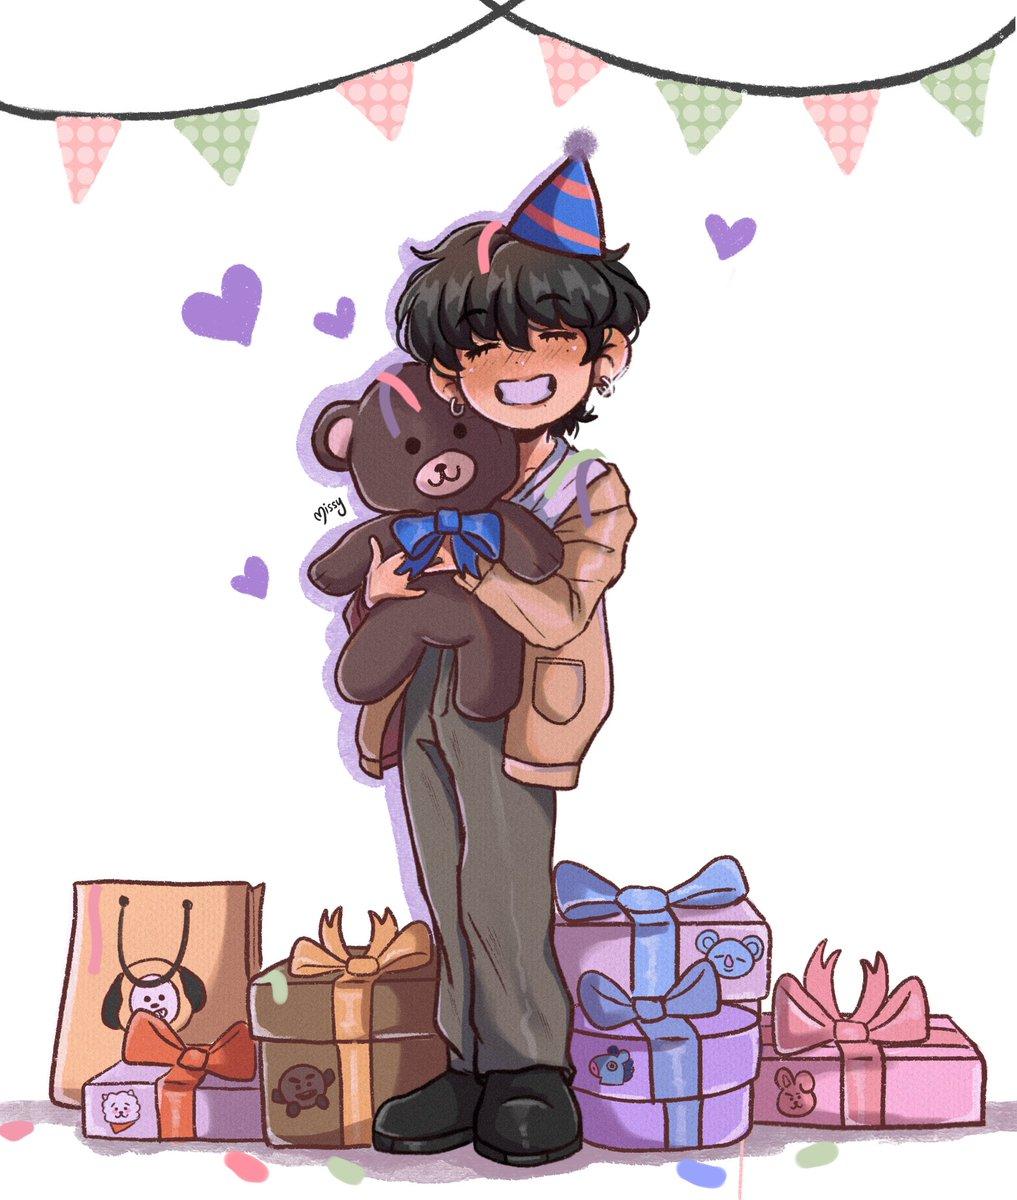 RT @missydesu_: Happy birthday, baby bear 🐻💜  #HappyTaehyungDay #WinterPrinceTaehyung #HappyBirthdayTaehyung https://t.co/TYGeuz5oKm